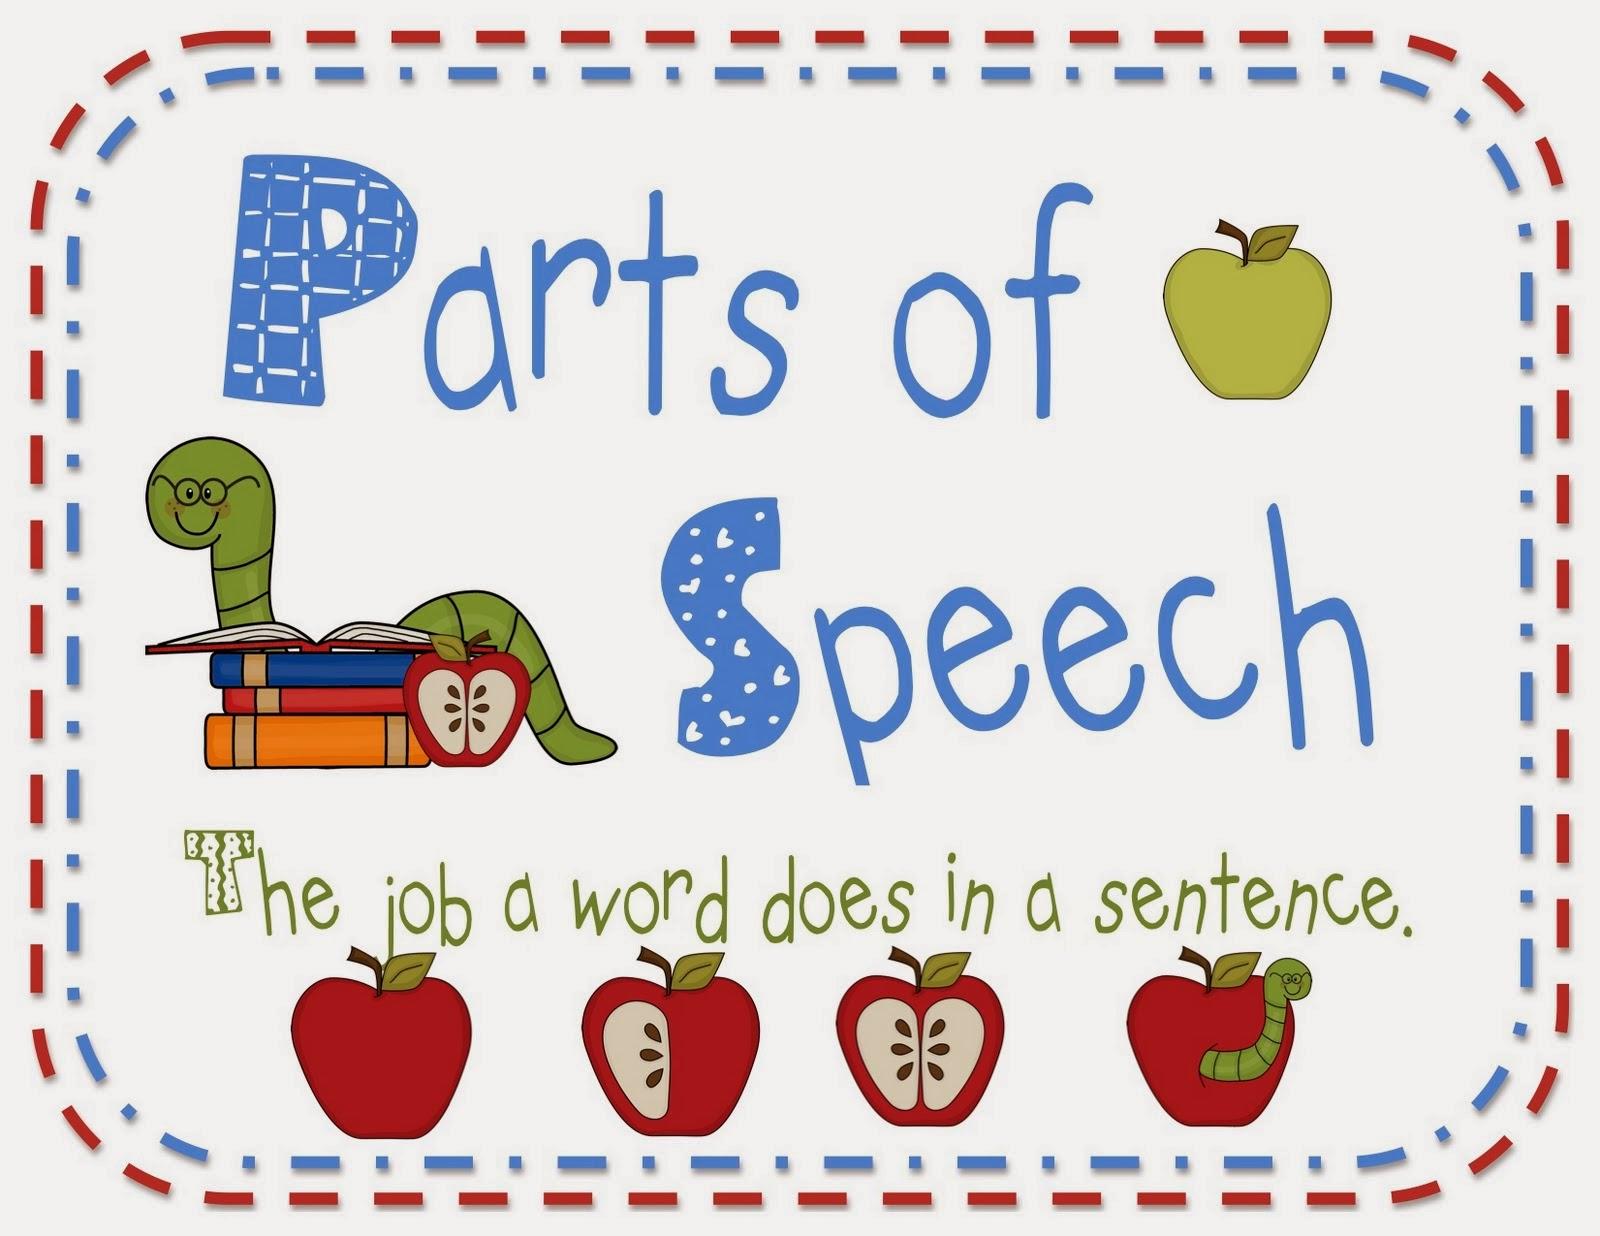 9 parts of the speech pdf